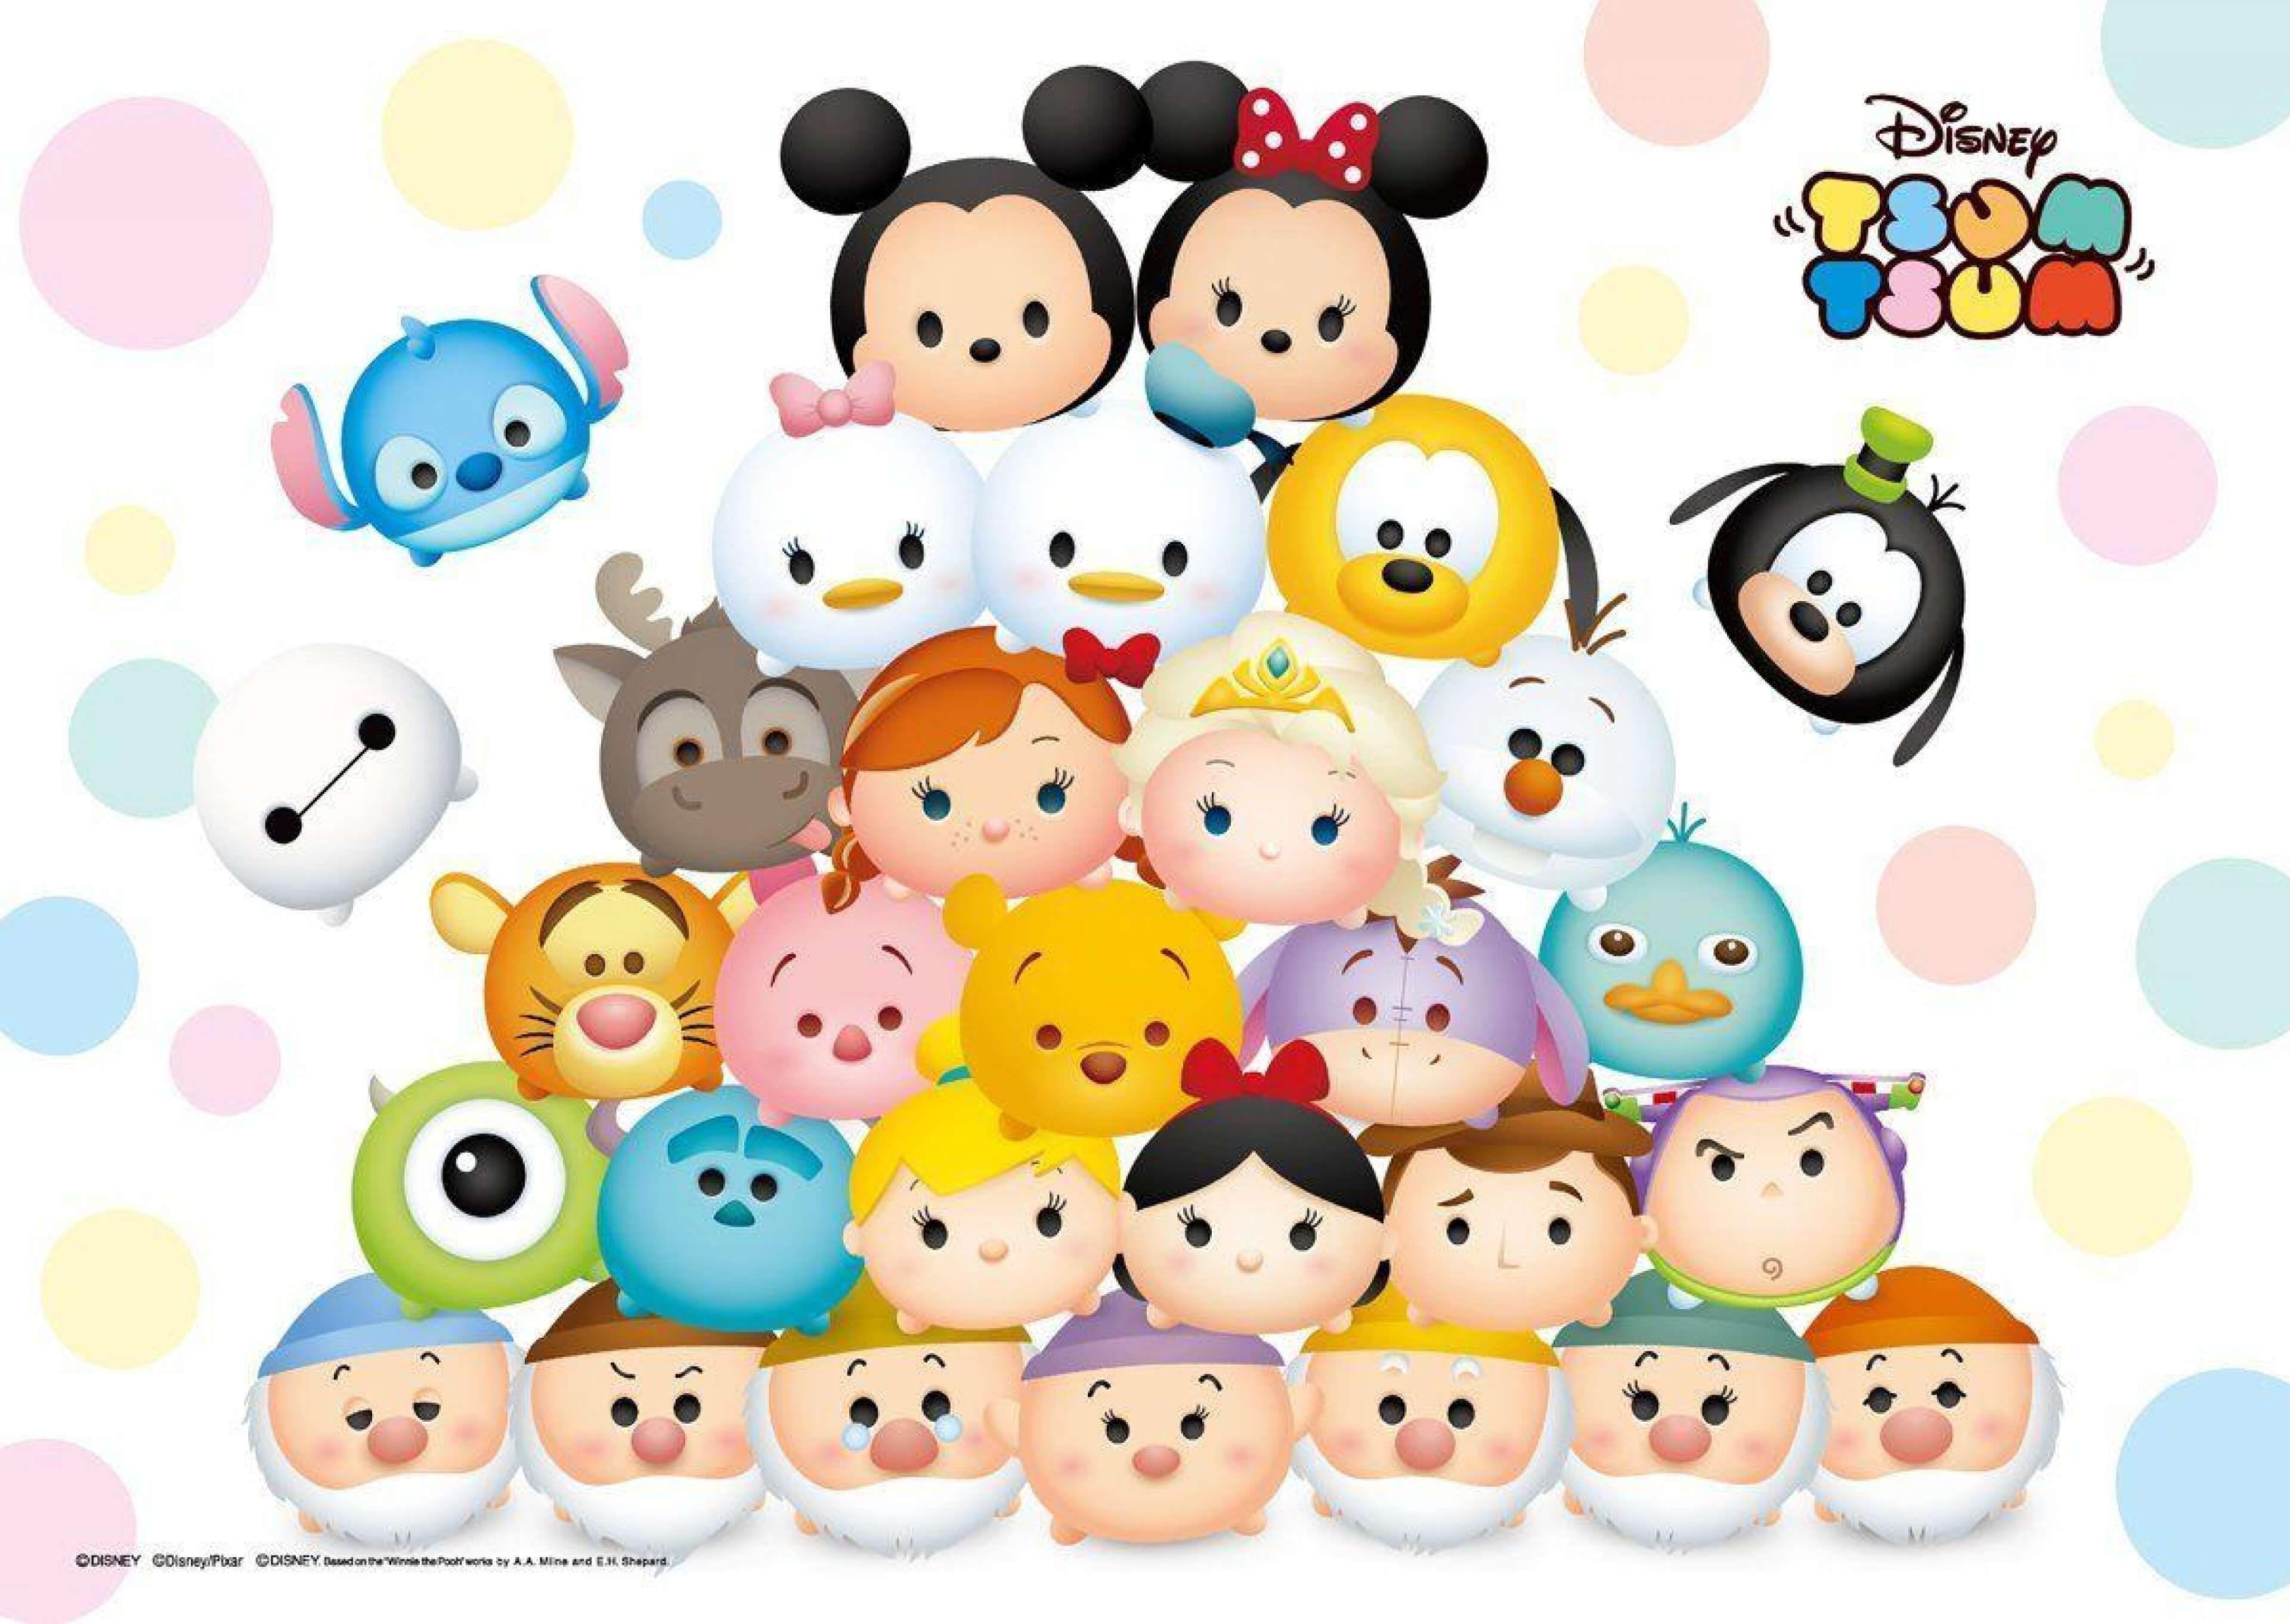 Https Www Wallpaperplex Com Best Tsum Tsum Wallpaper 4k Hd Kartun Kartun Disney Ulang Tahun